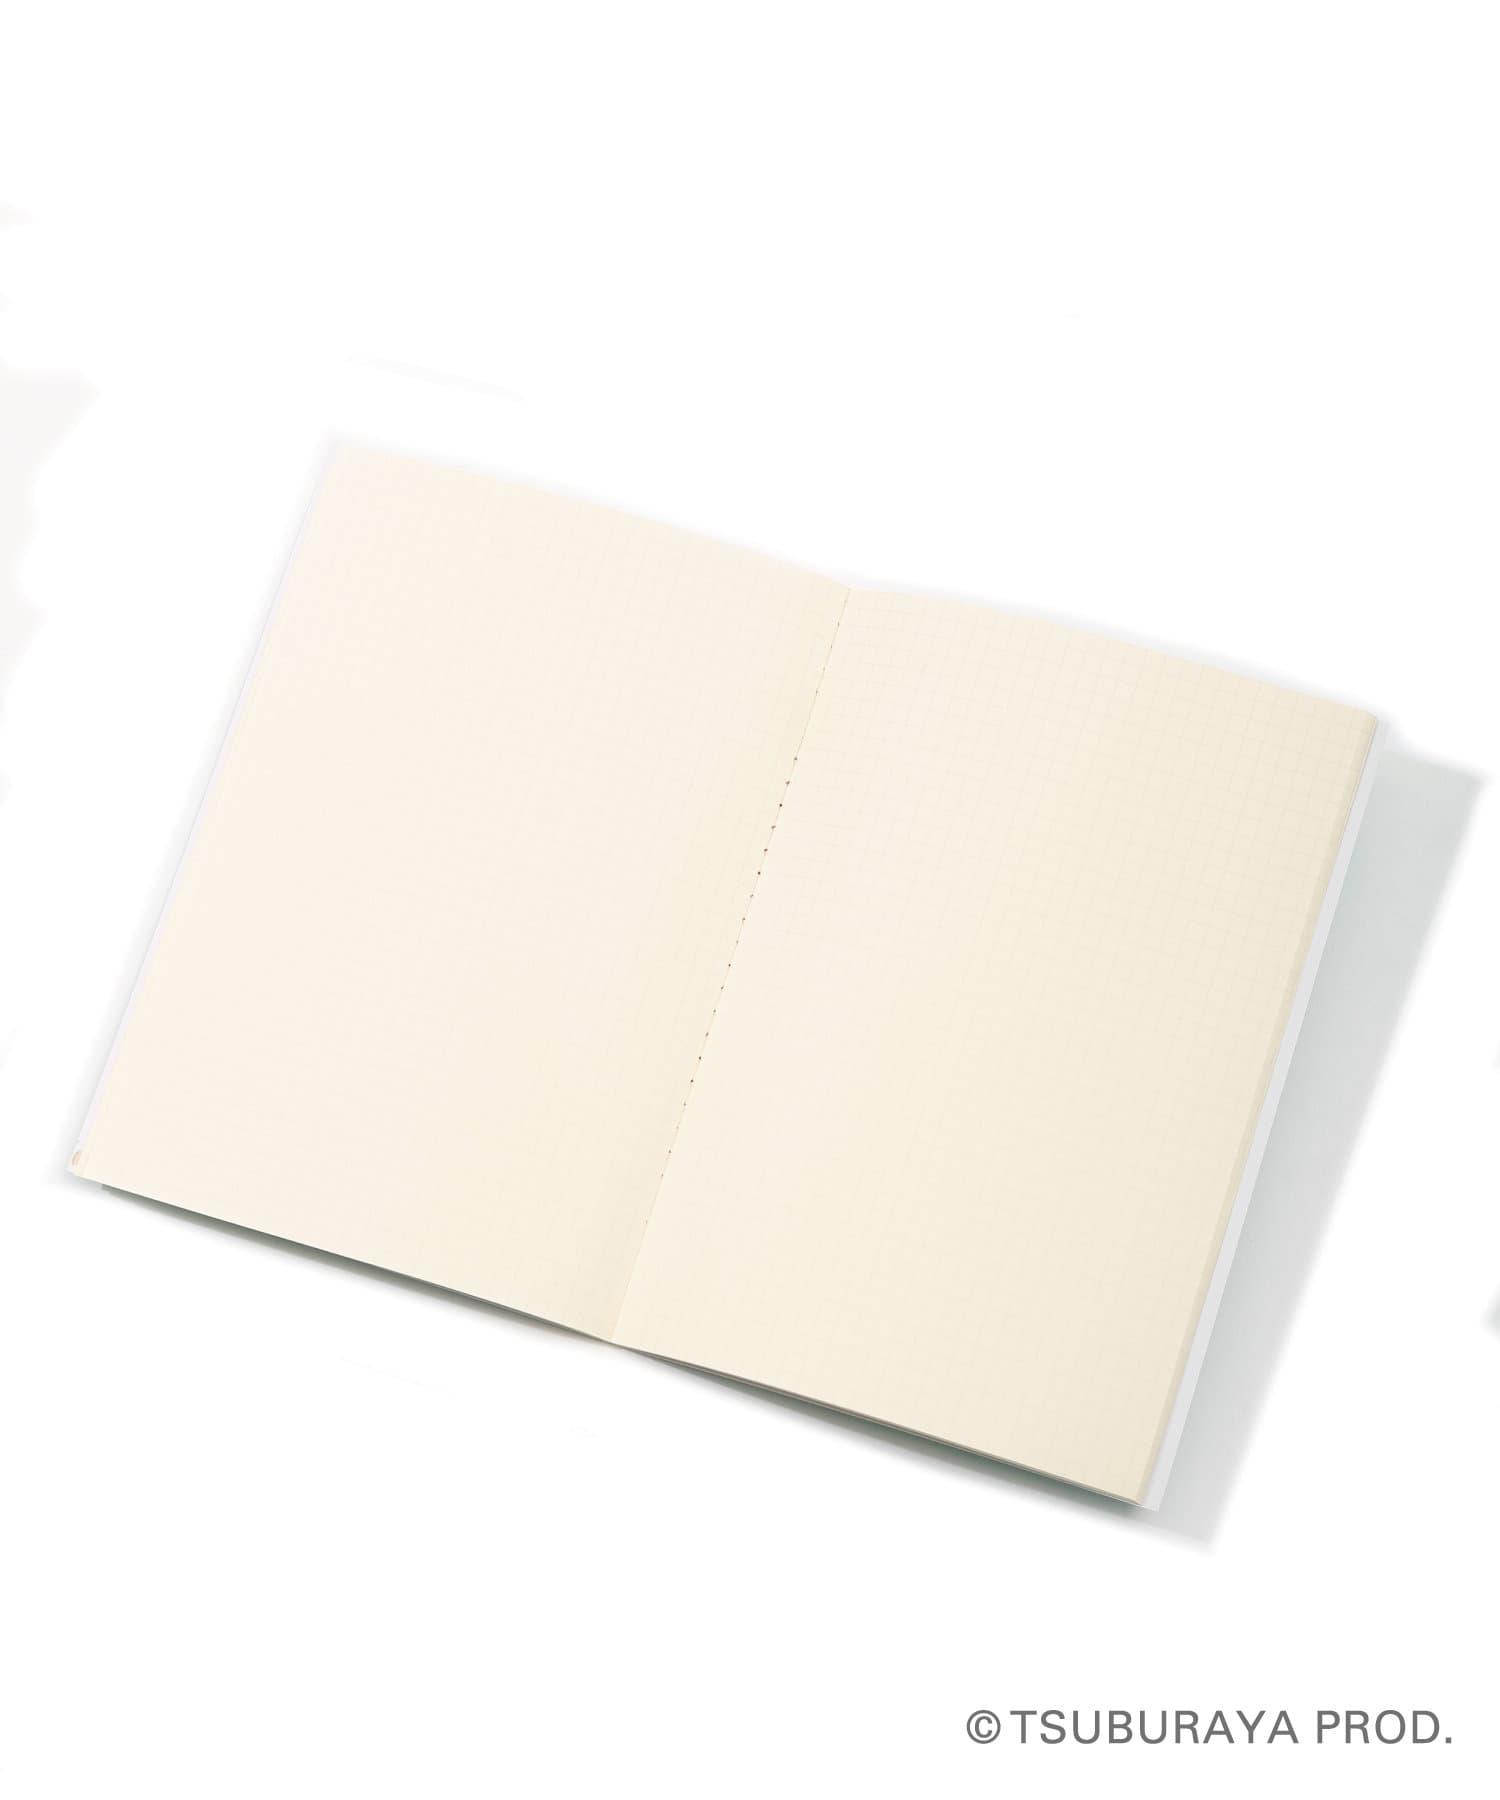 3COINS(スリーコインズ) 【ASOKO】【ウルトラマンシリーズ】ノート